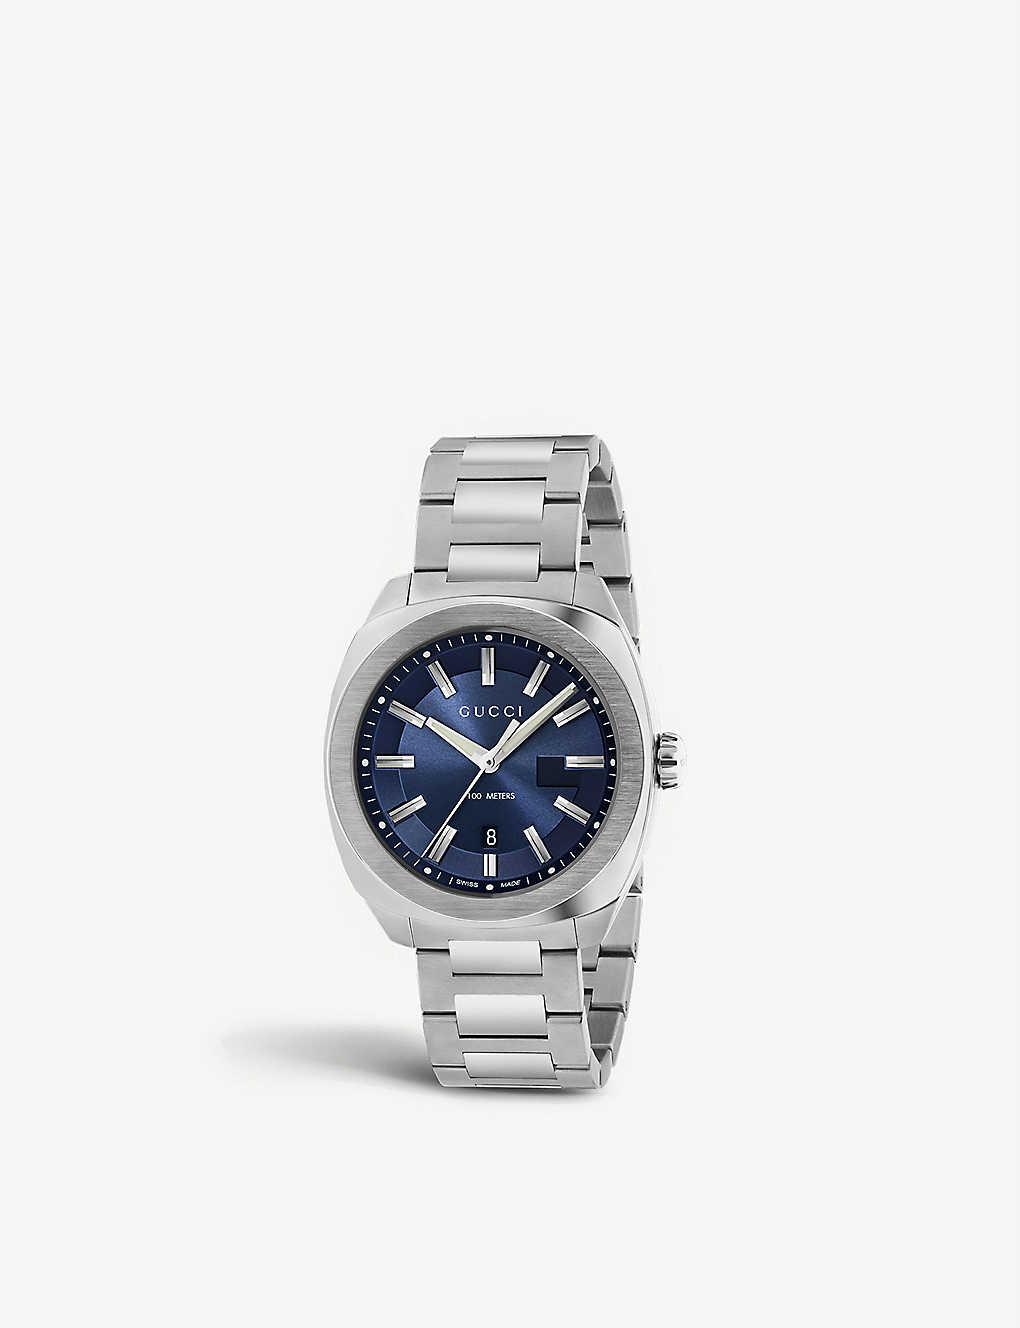 009b7751858 GUCCI - YA142303 Cushion stainless steel watch